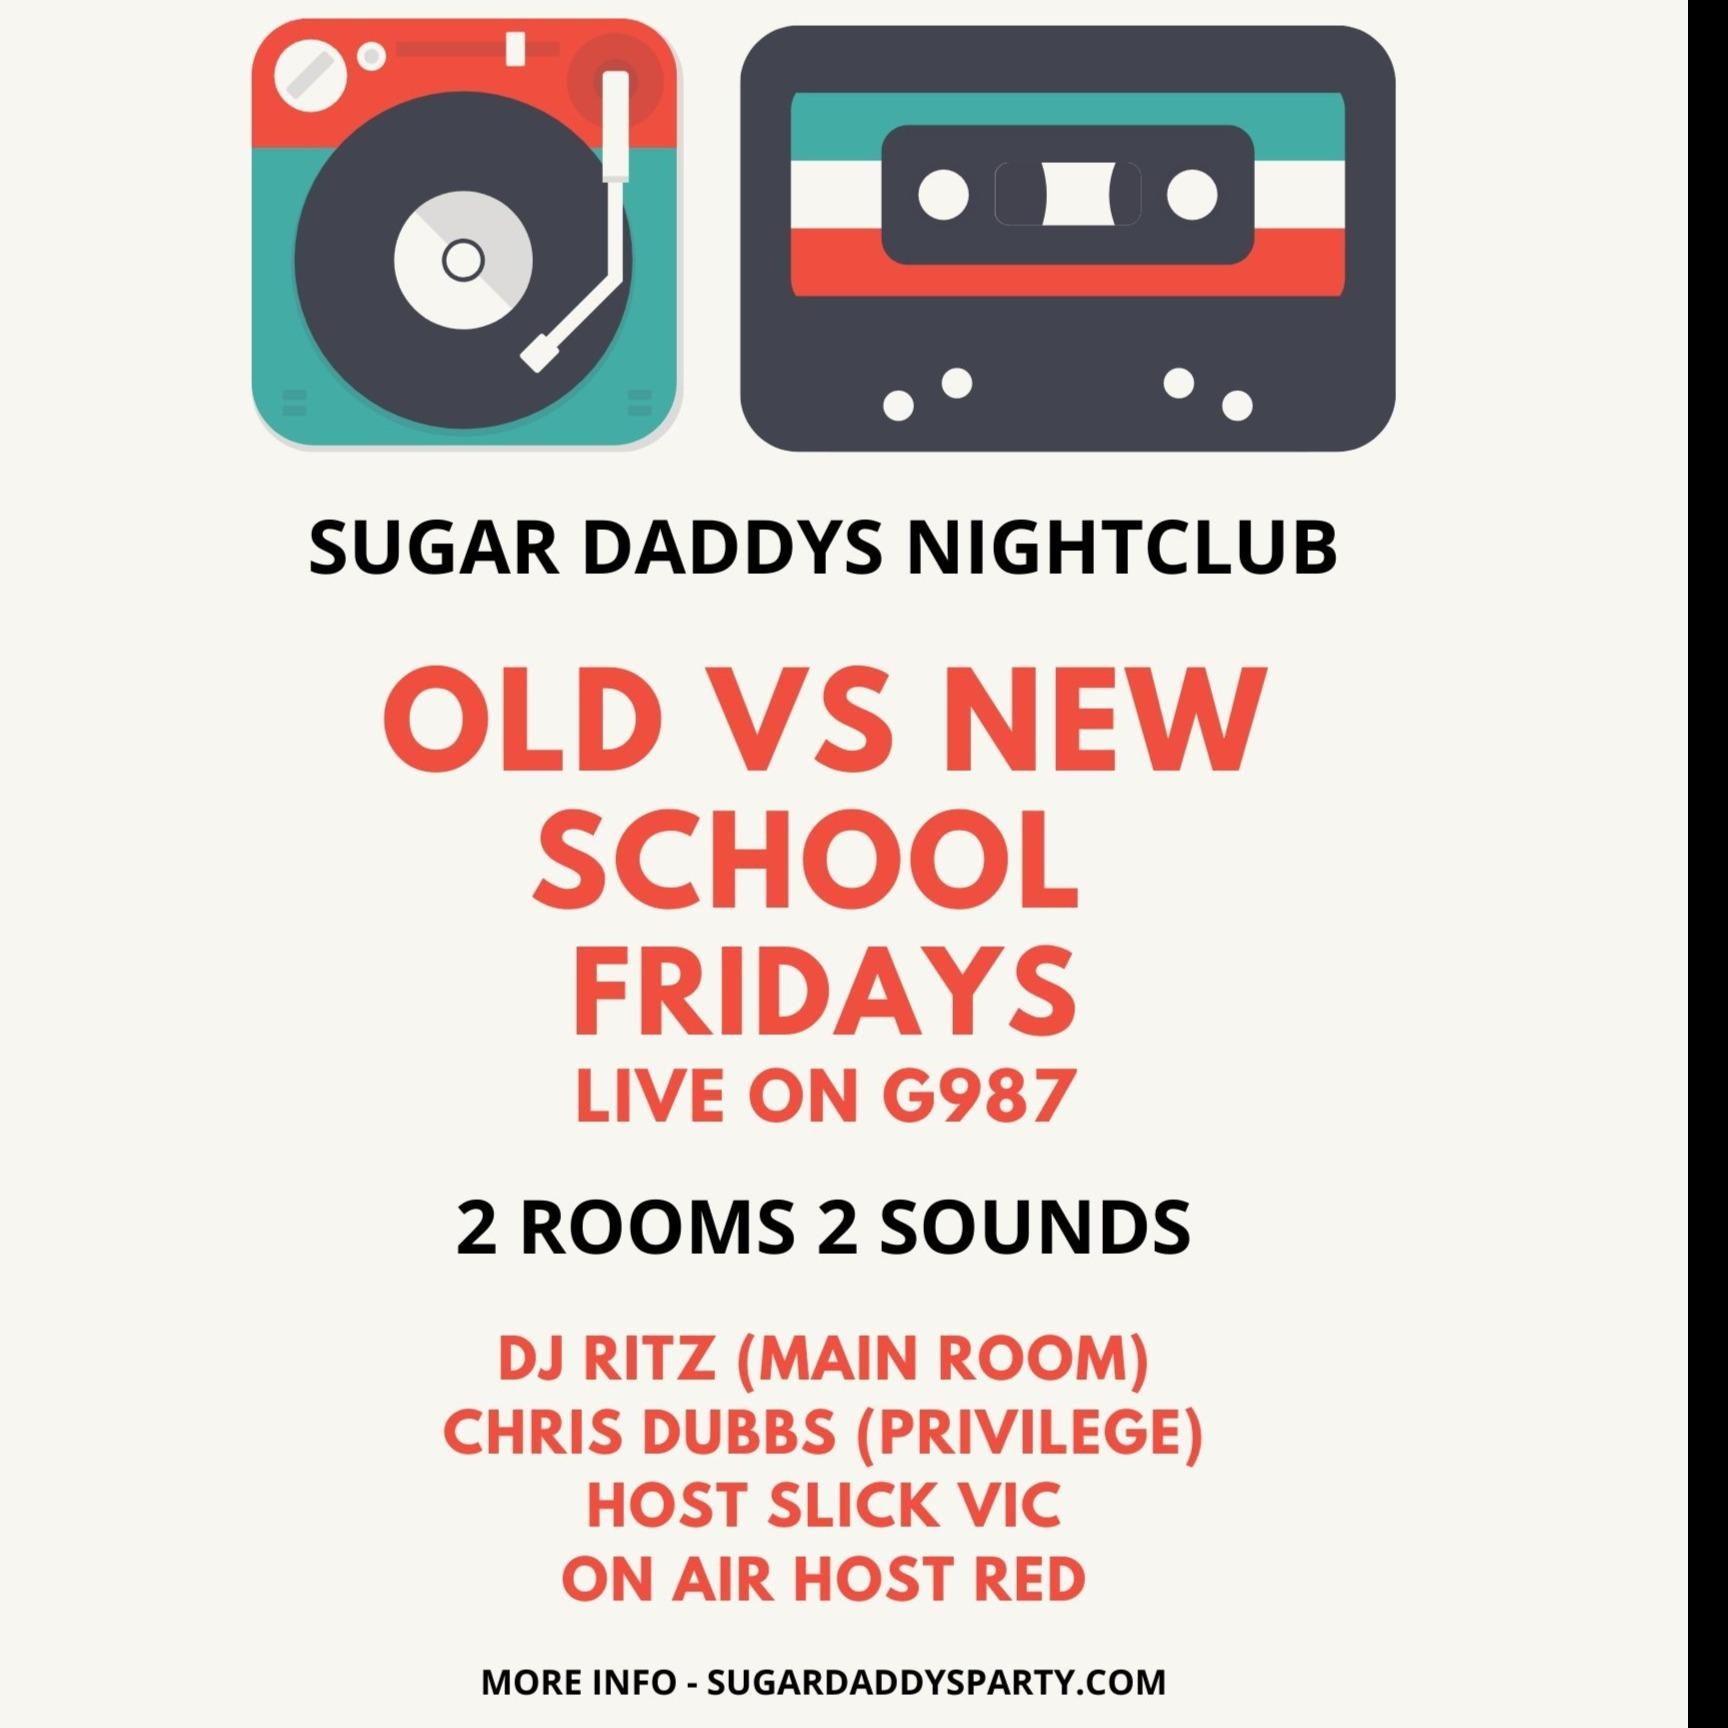 OLD VS NEW SCHOOL FRIDAYS SUGAR DADDYS 2 ROOMS 2 SOUNDS LIVE G987 W/ DJ RITZ, SLICK VIC, CHRIS DUBBS